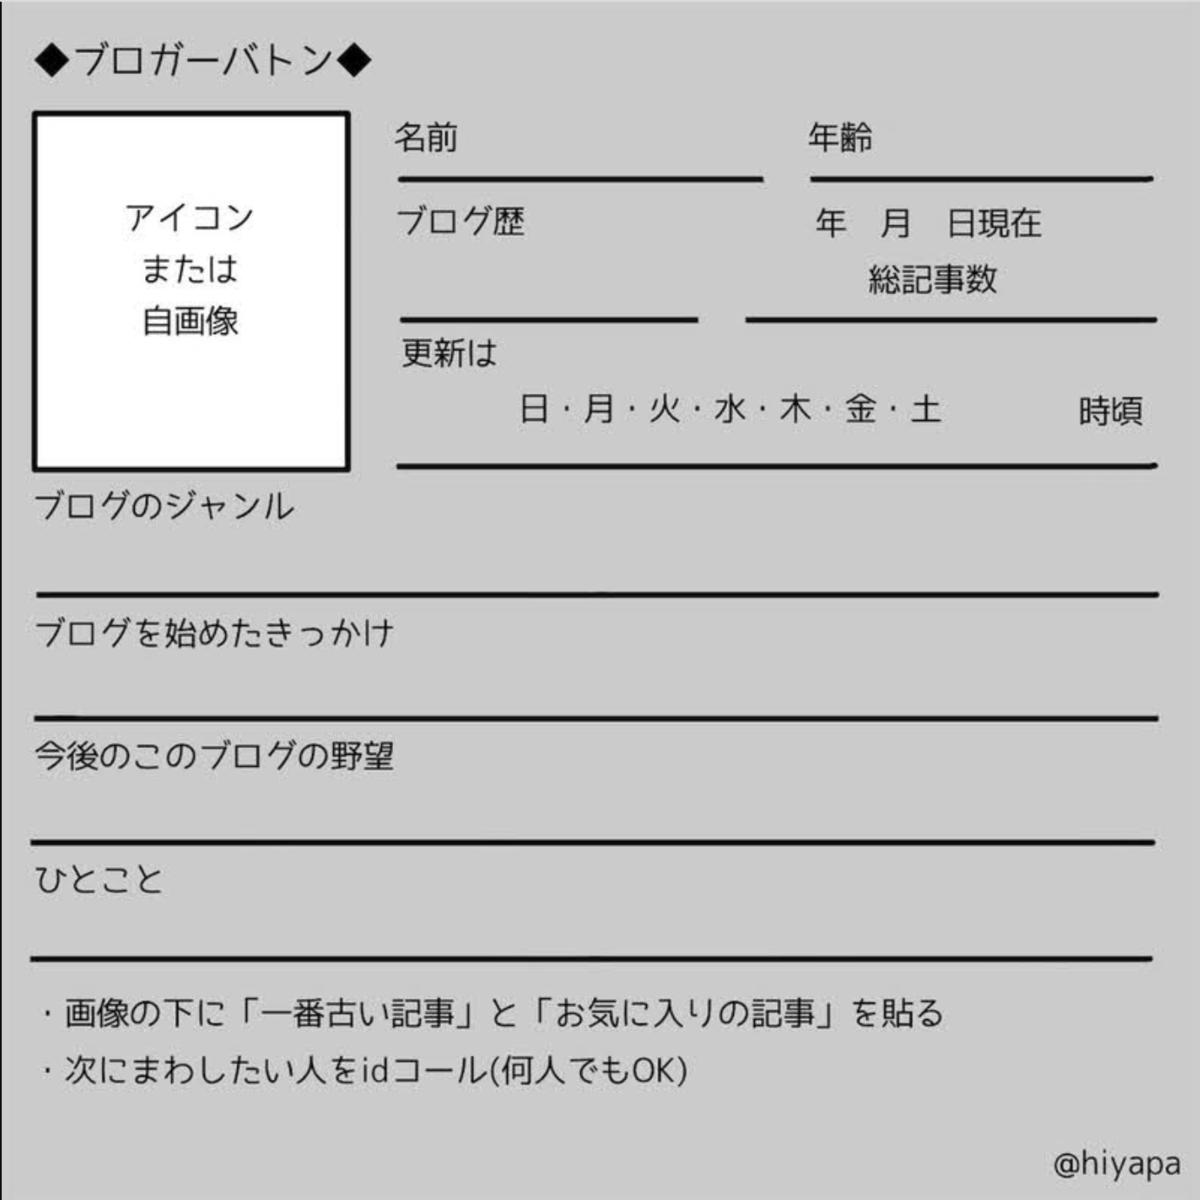 f:id:jlk415:20200704184701p:plain